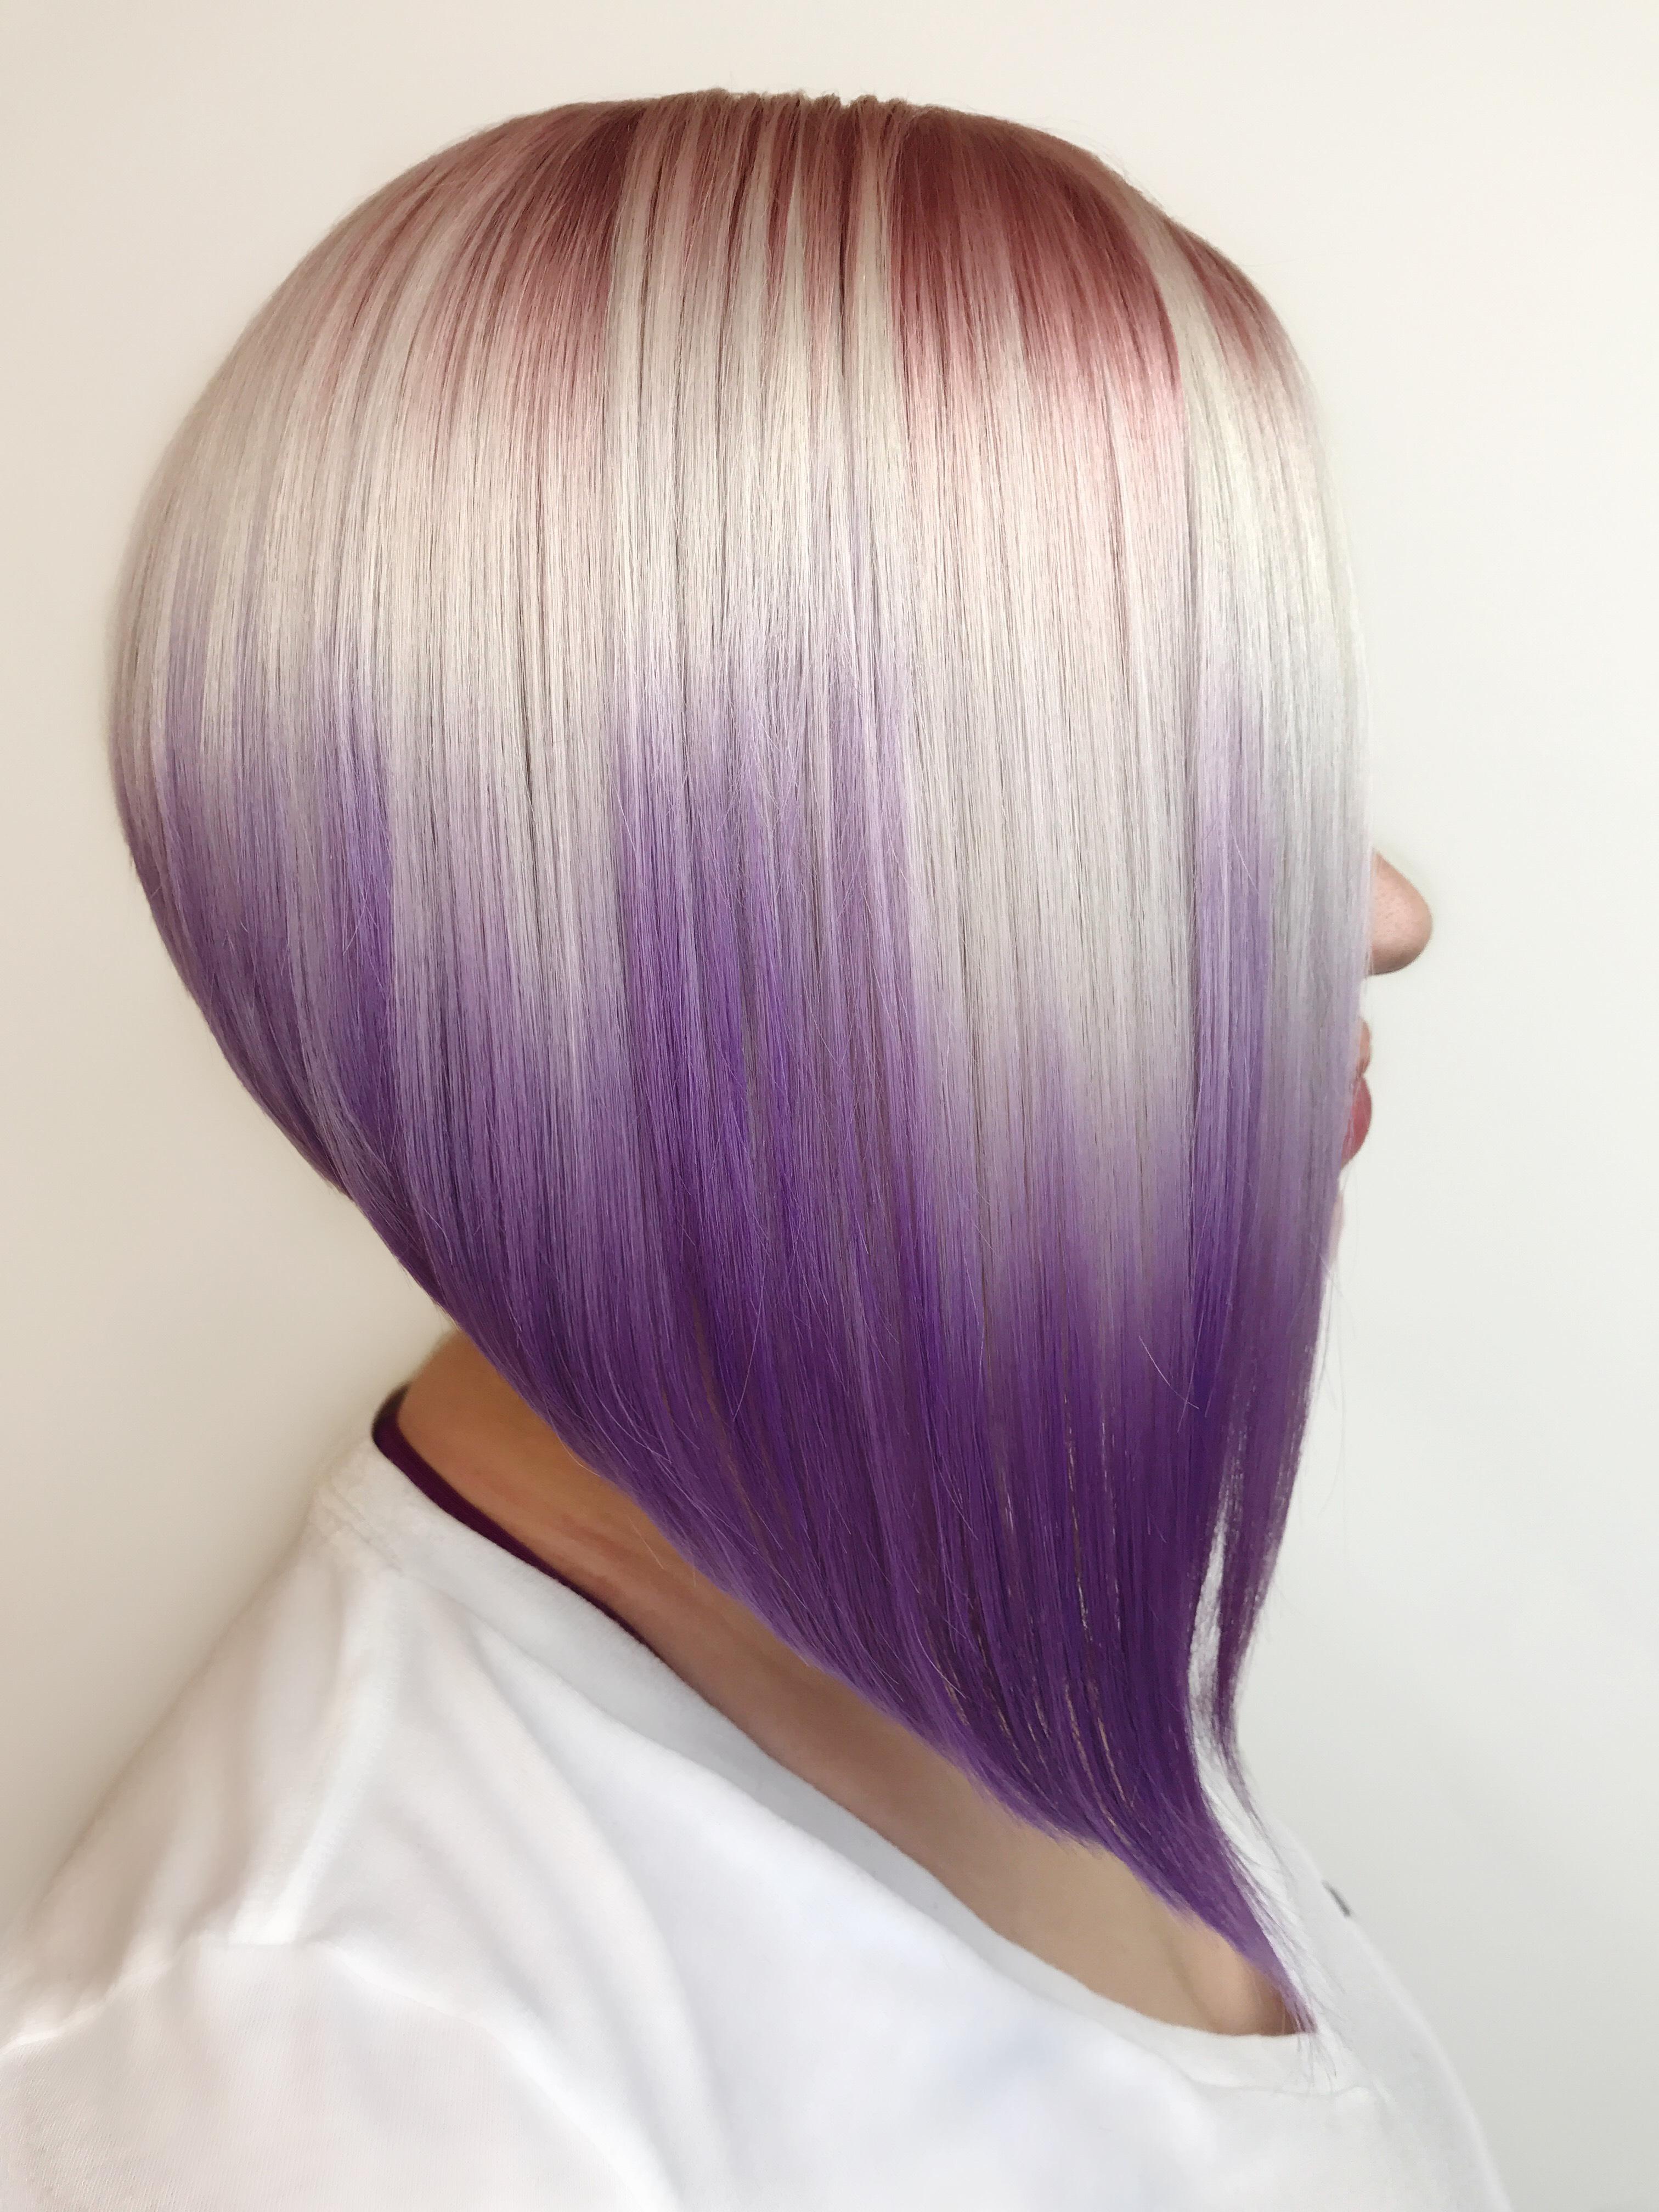 FORMULA: Tri-Color Rose Gold and Purple Tourmaline Melt